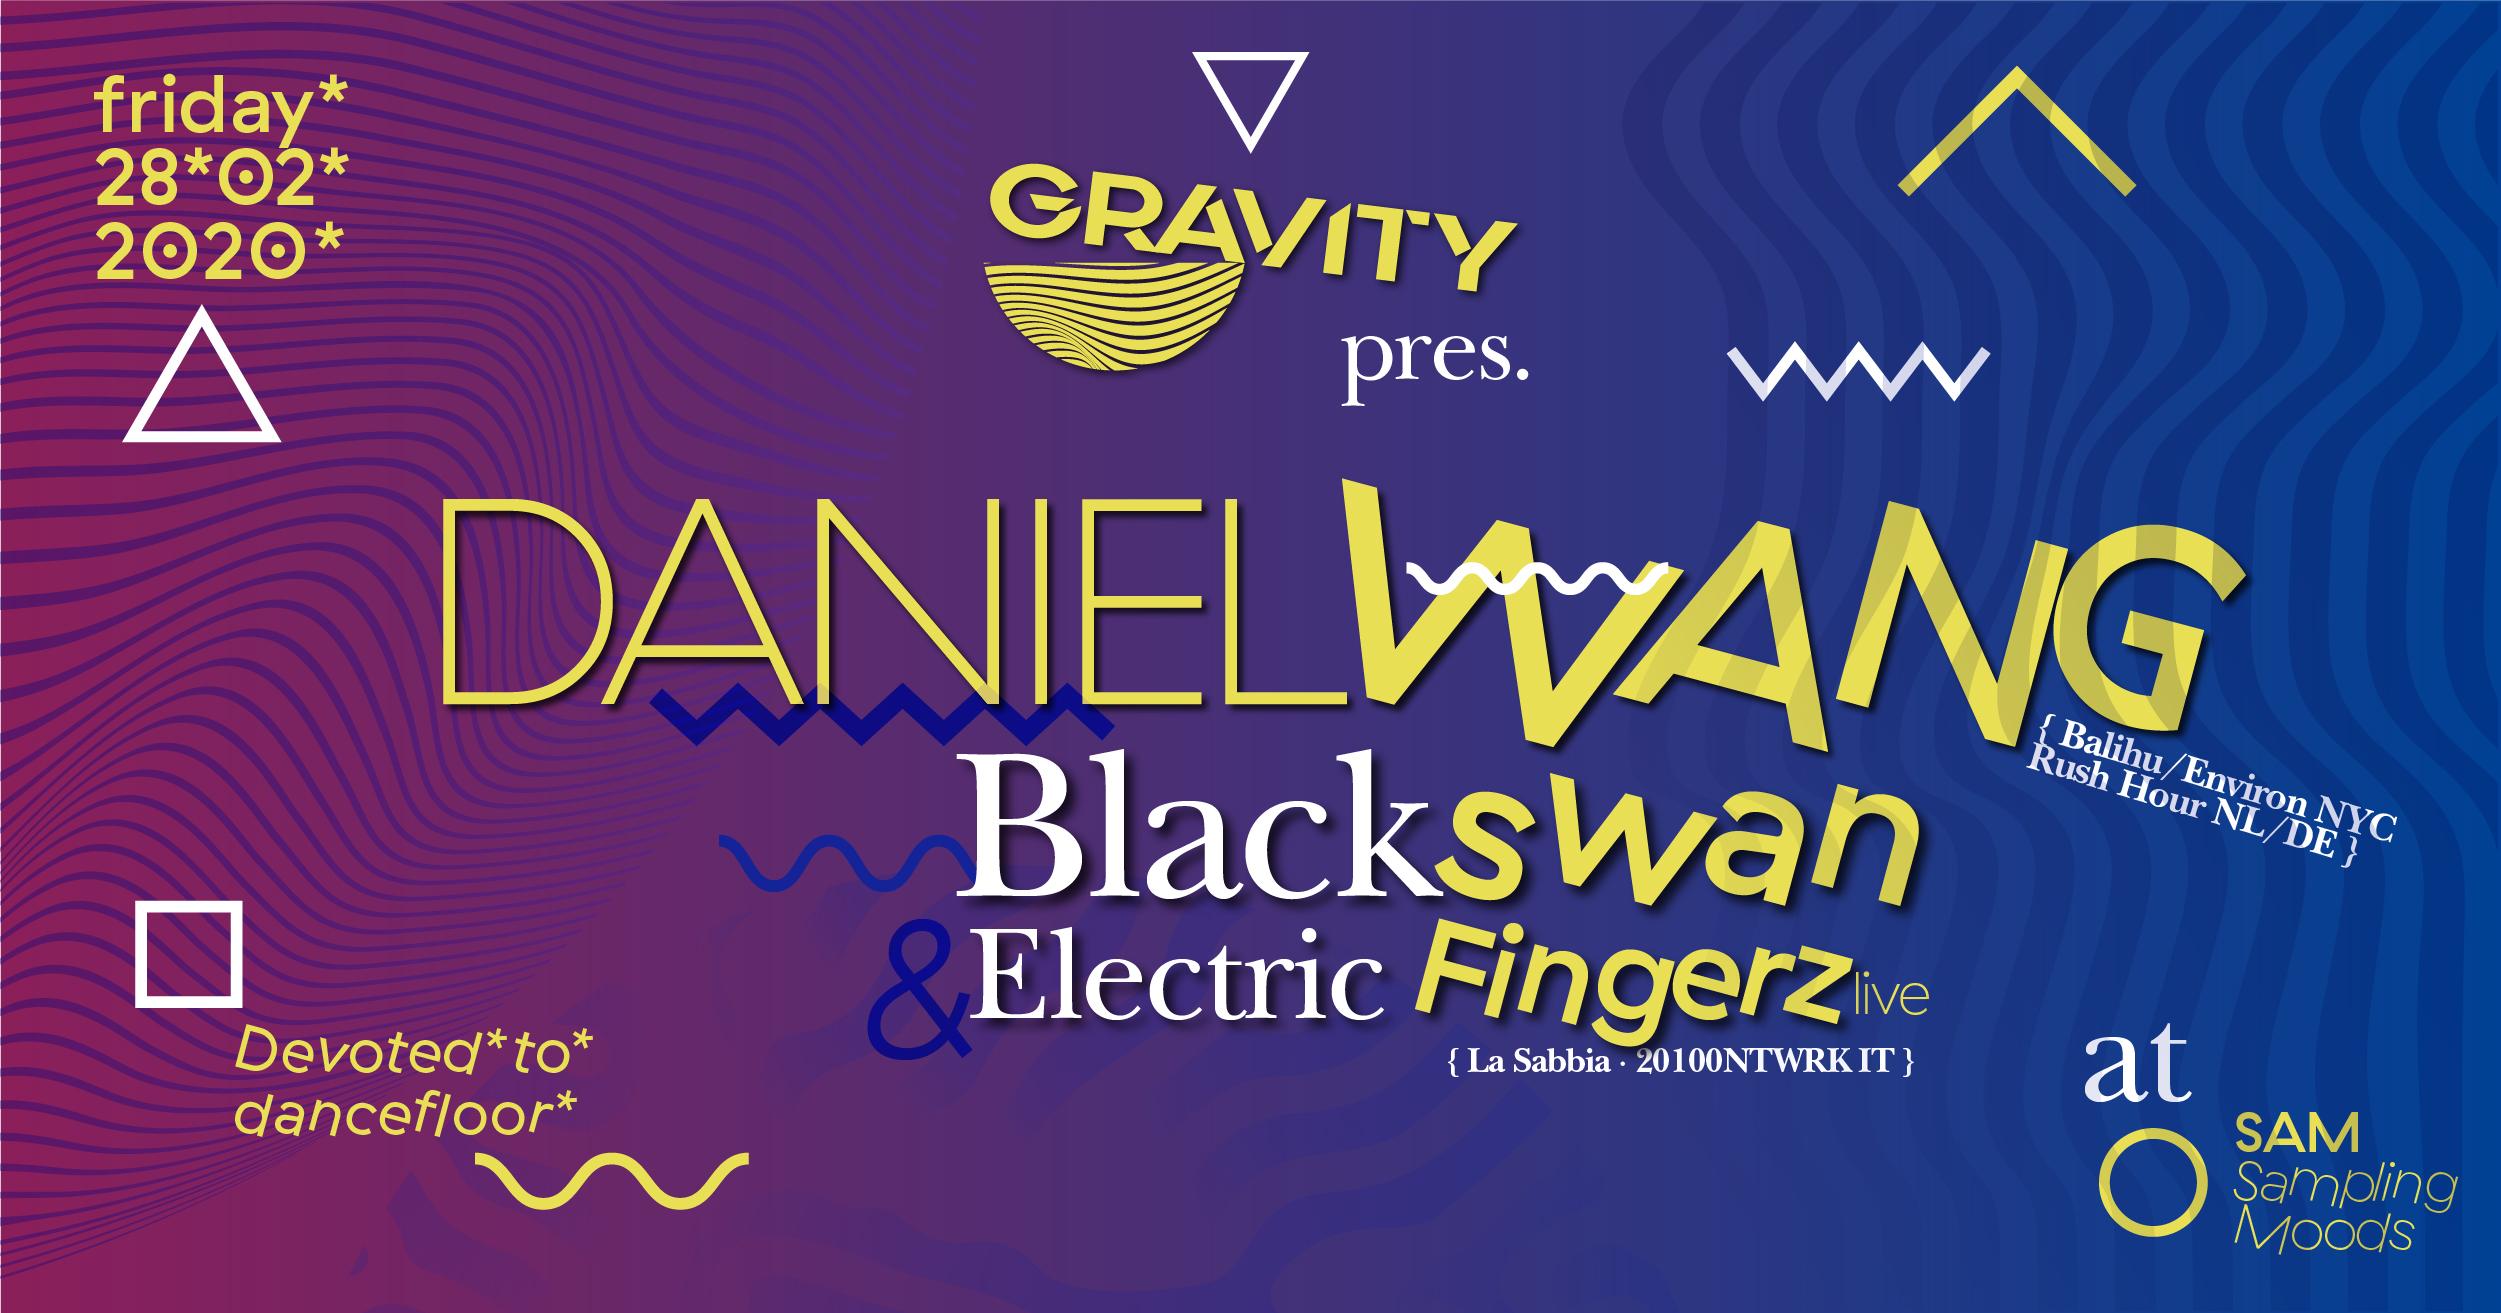 Ven 28.02.2020 – Gravity pres. Daniel Wang